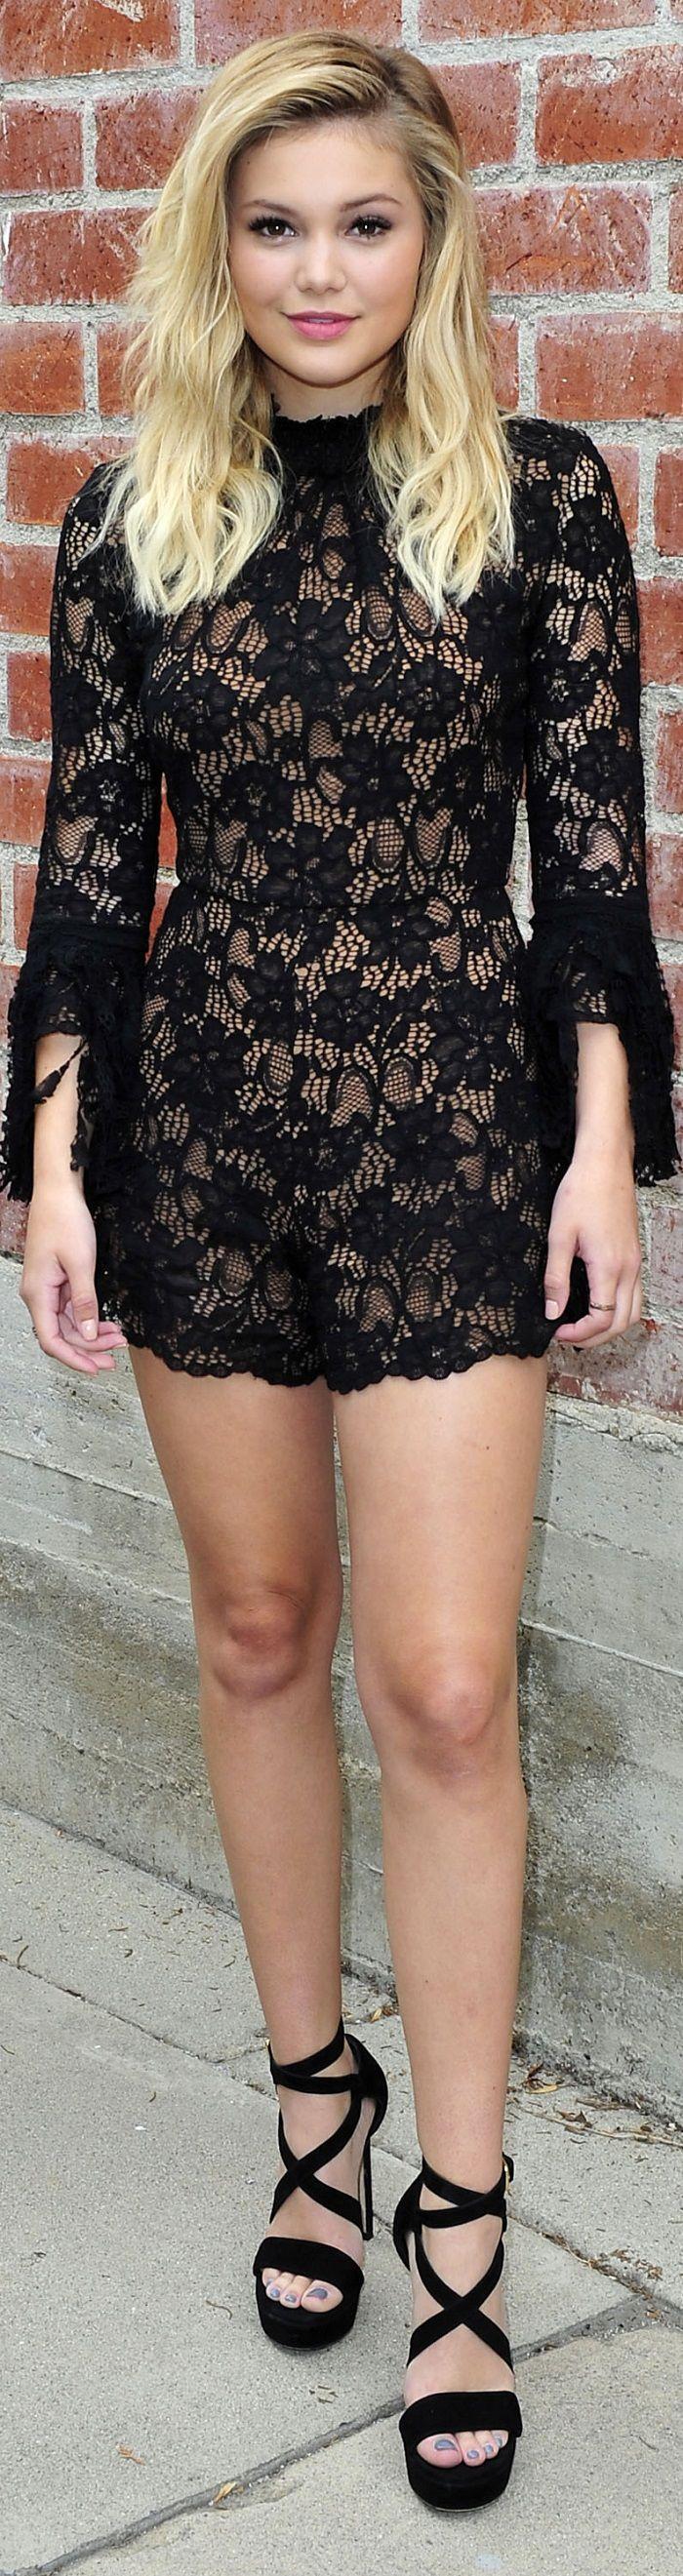 Olivia Holt Michael Simon Photoshoot in Hollywood May 2016